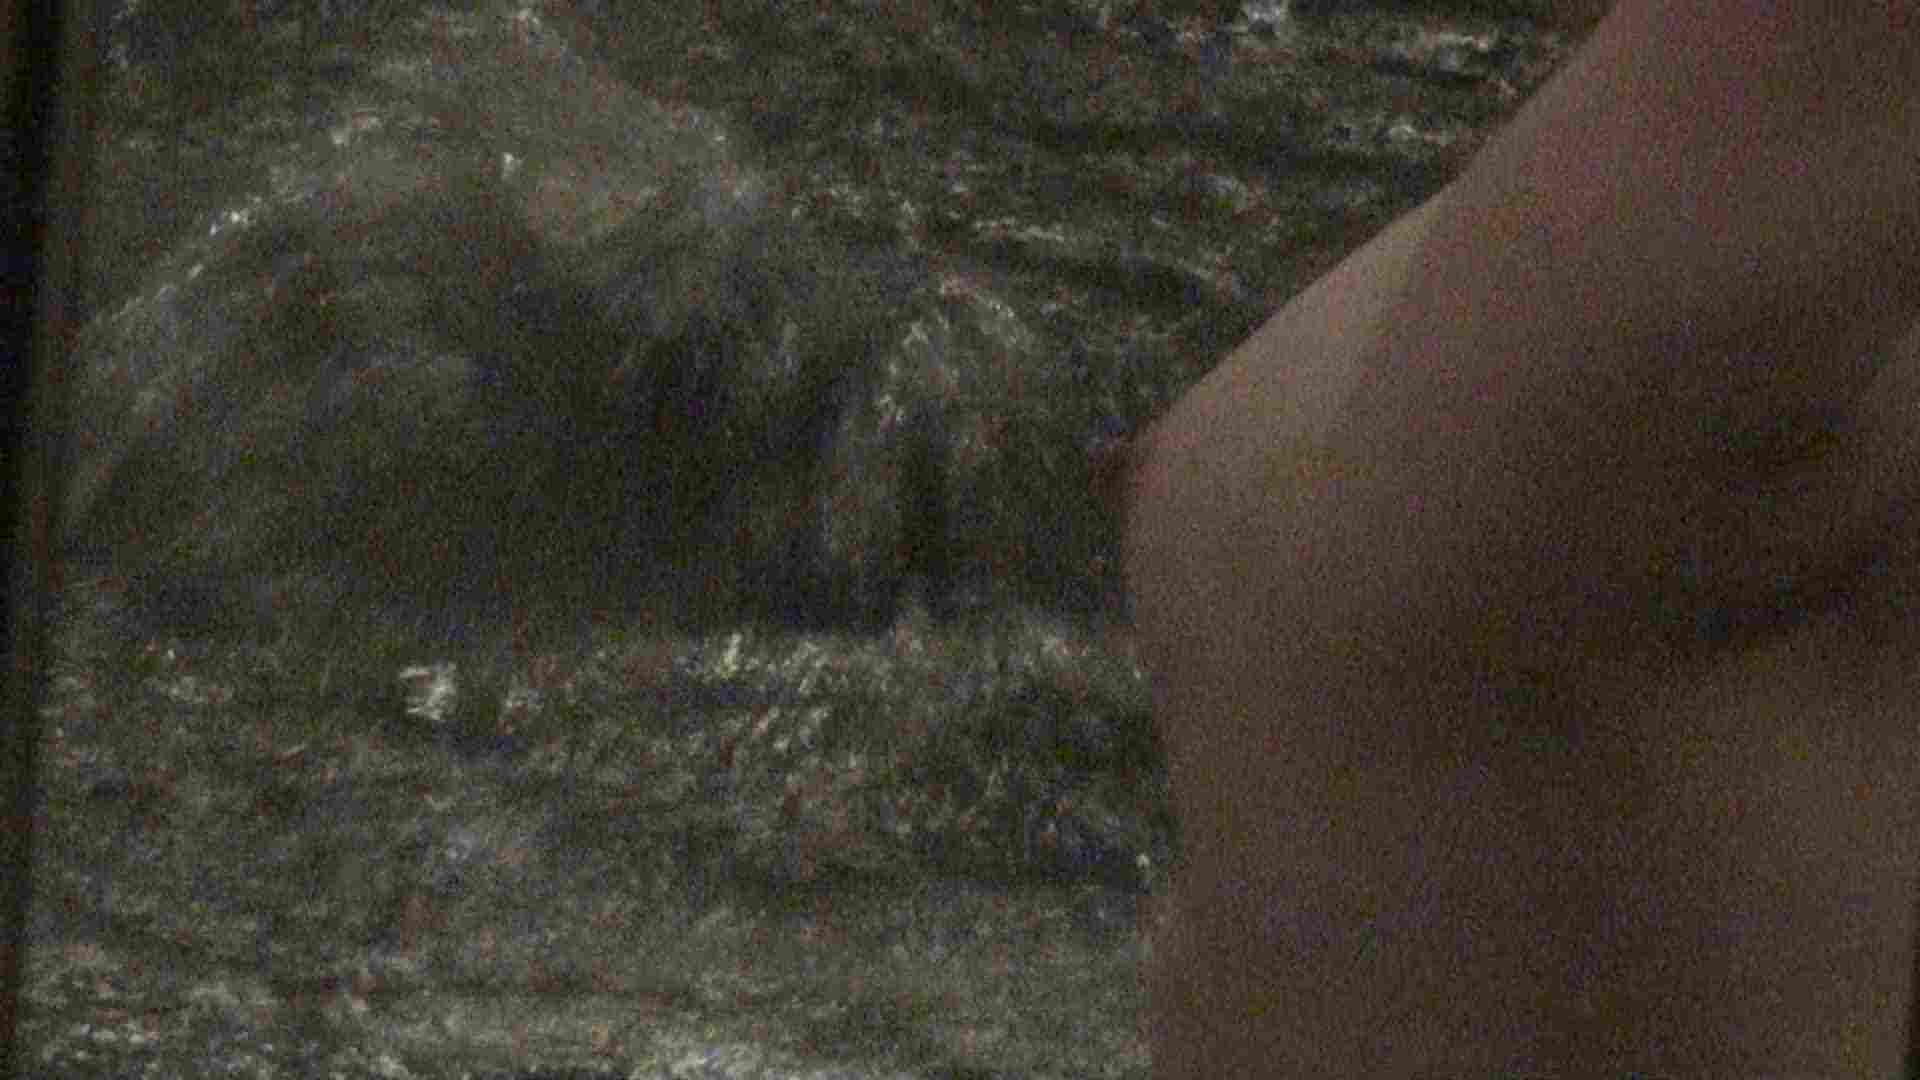 Aquaな露天風呂Vol.432 盗撮   OLエロ画像  86PICs 67